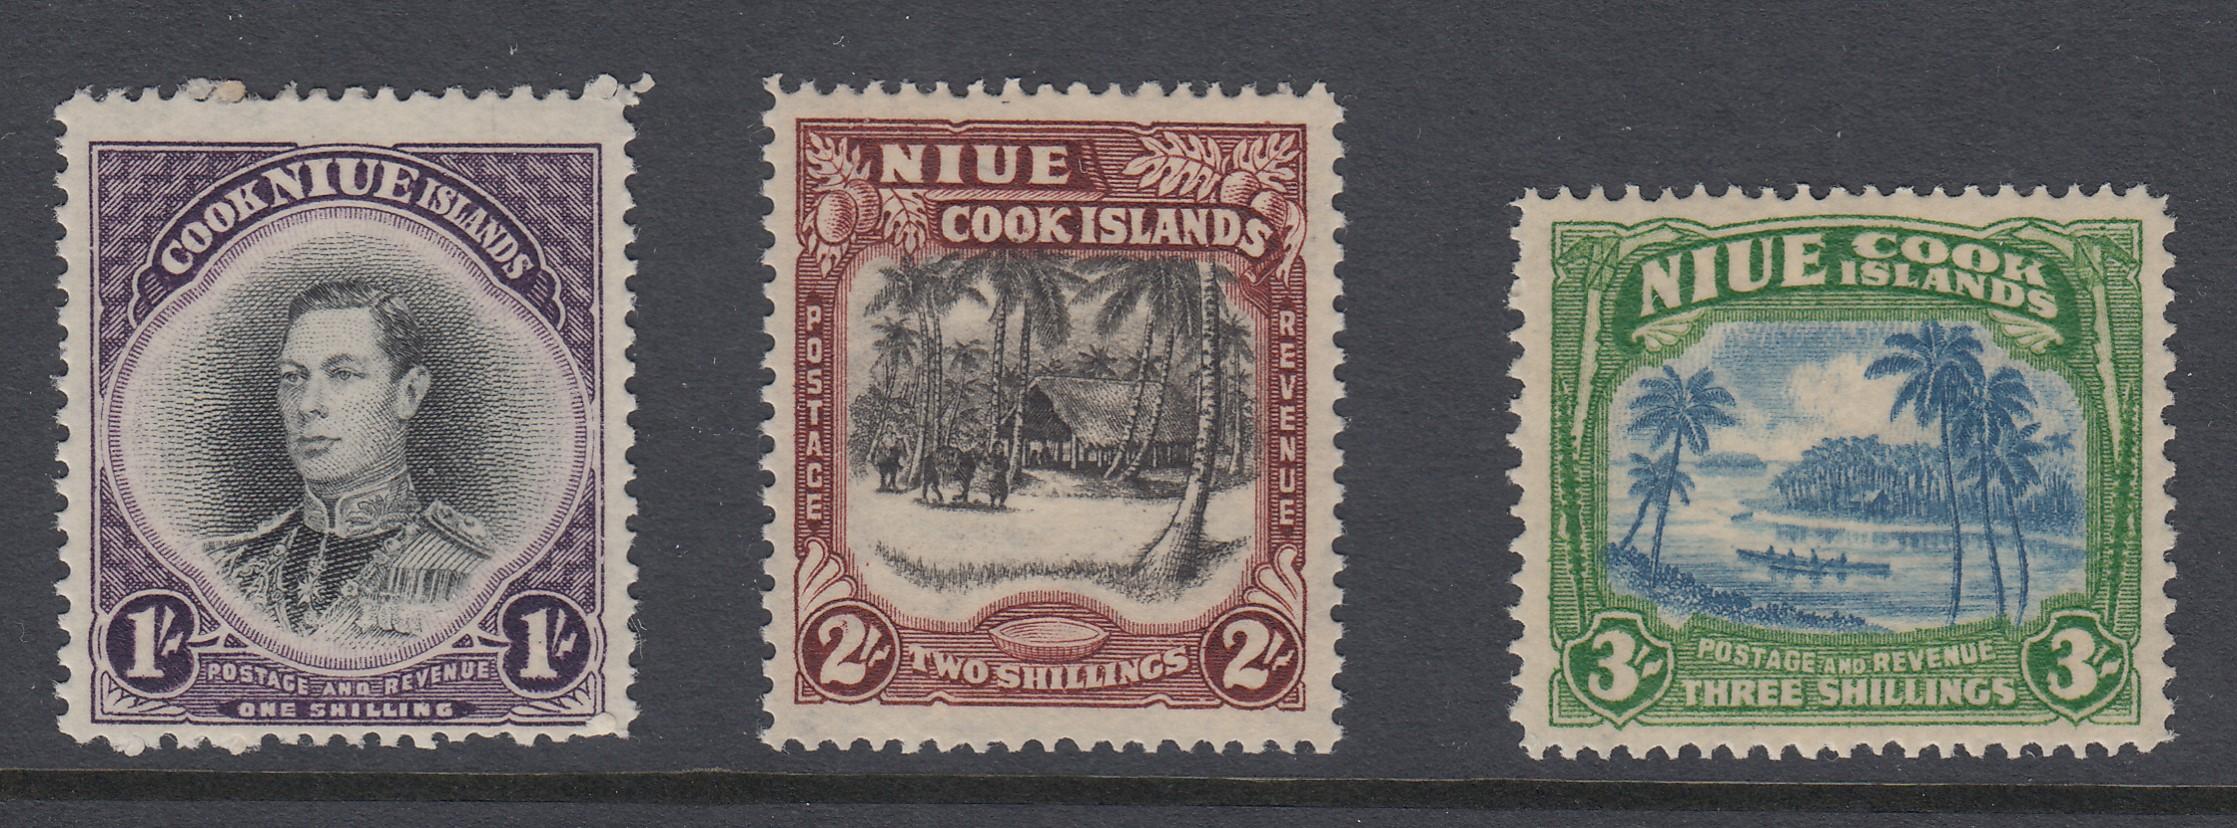 STAMPS NIUE ISLANDS, 1938 set of three M/M, SG 75-77.